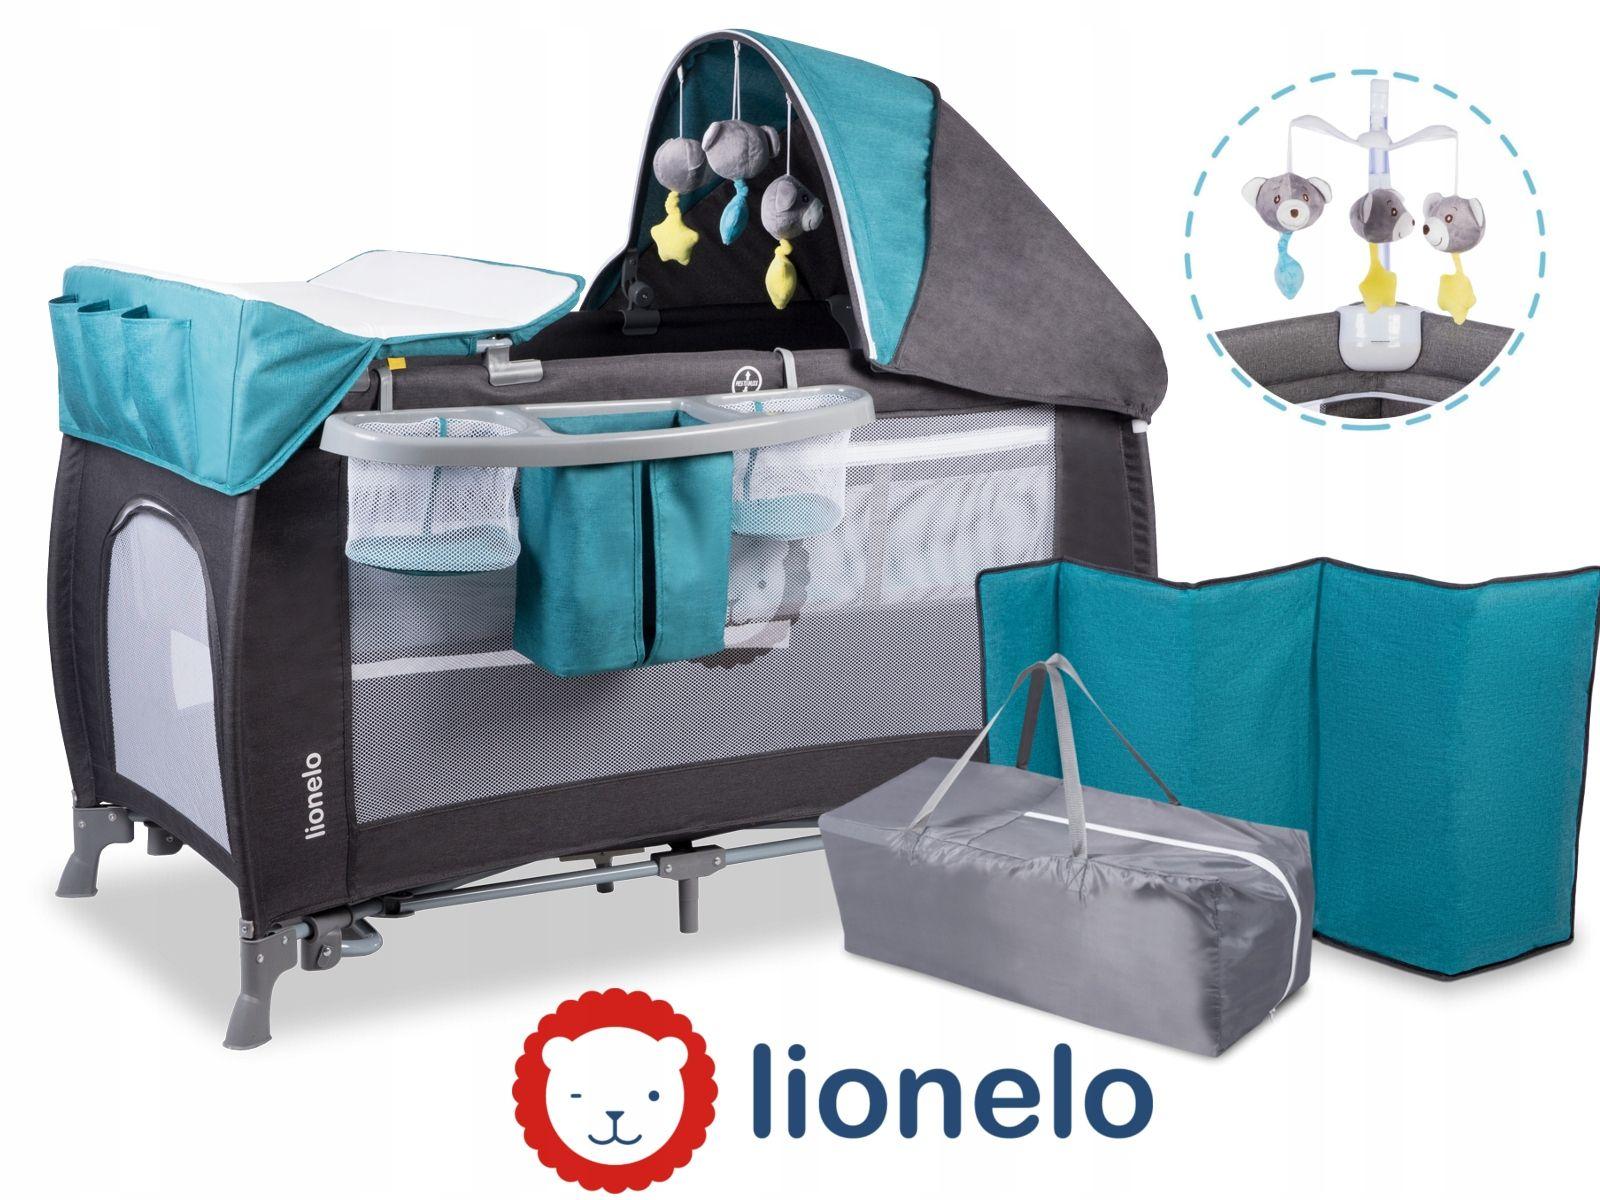 Kup Teraz Na Allegro Pl Za 349 00 Zl Lozeczko Turystyczne Kojec Lionelo Simon Len 6778050537 Allegro Pl Radosc Zakupow Toddler Bed Home Decor Commode